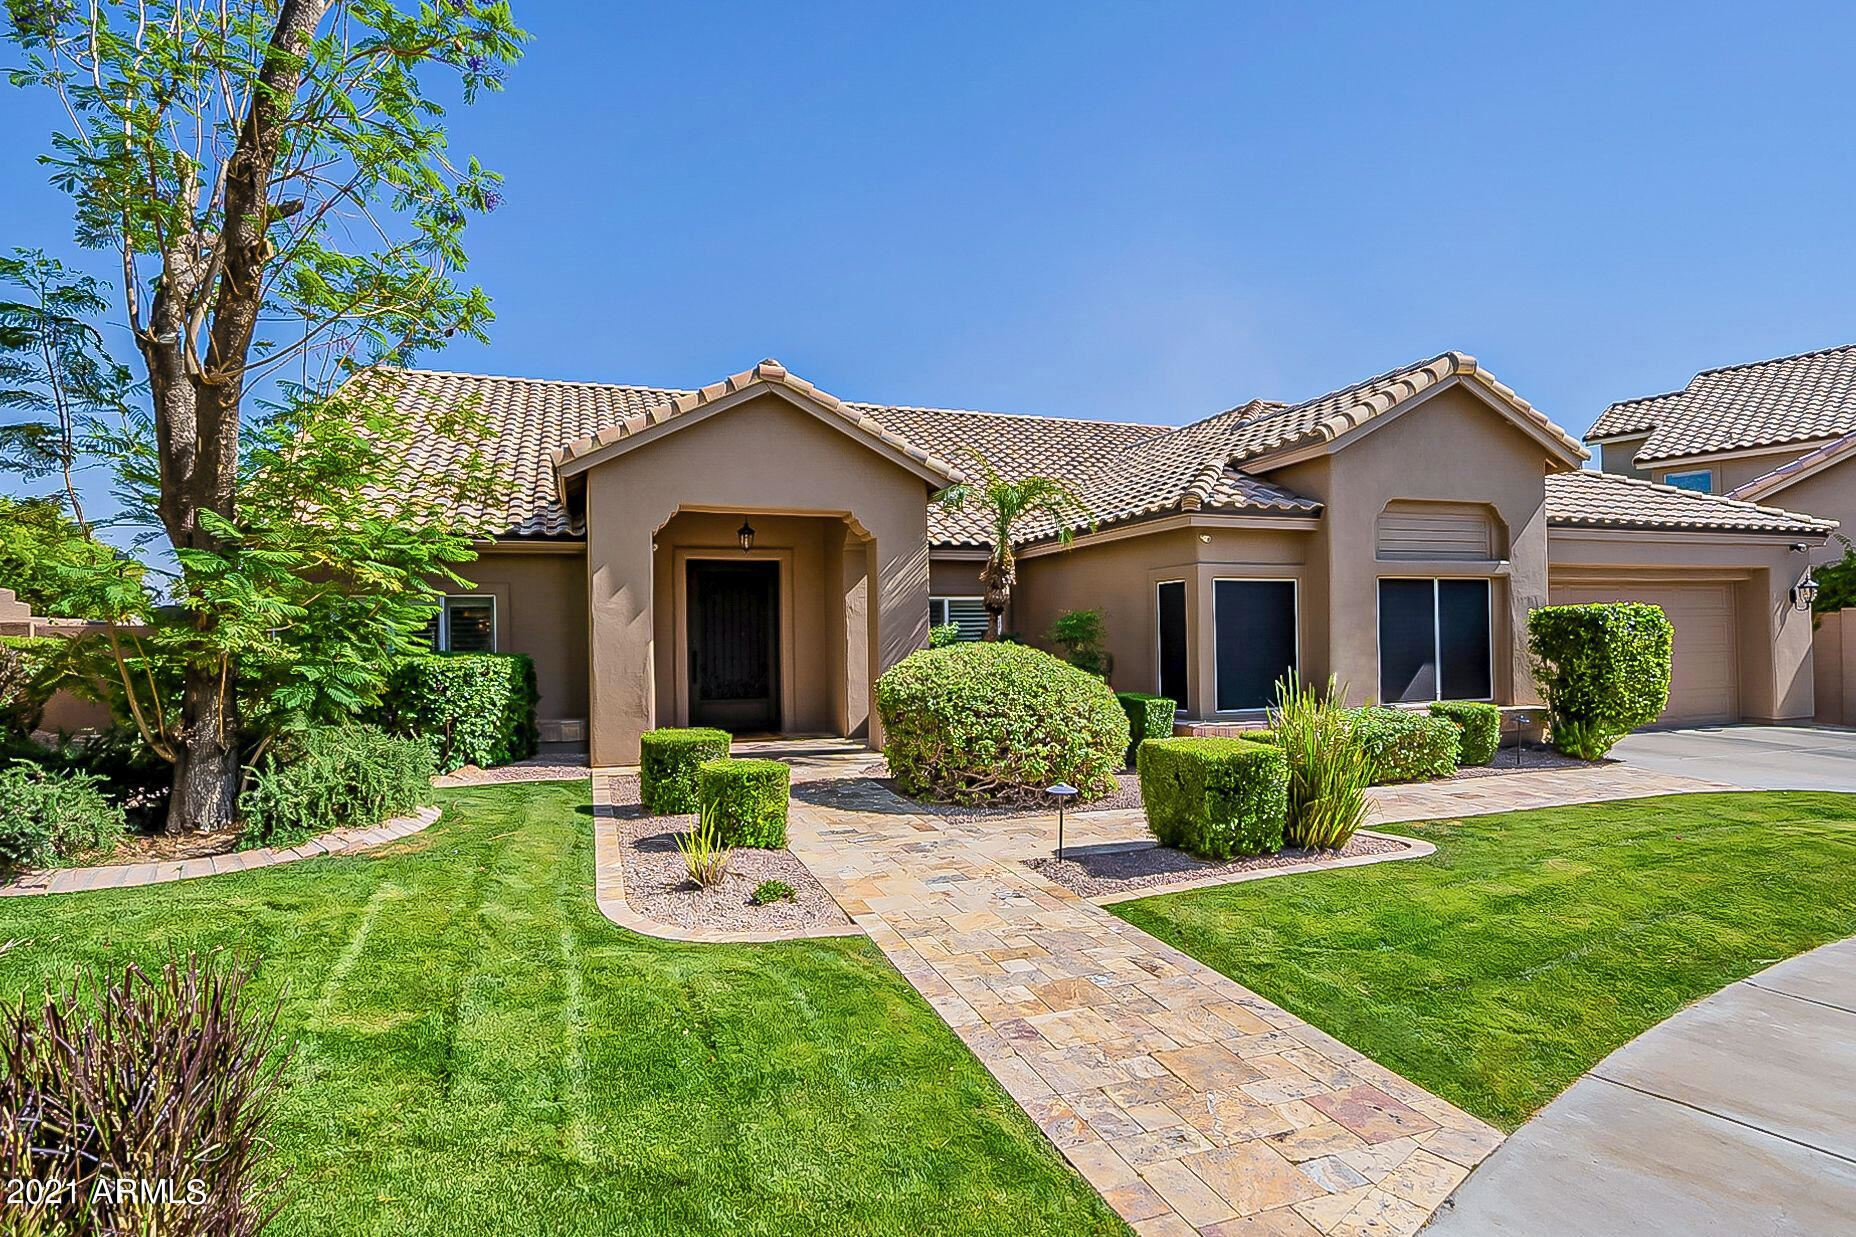 3747 E KENT Drive, Phoenix, AZ 85044 - MLS#: 6246407